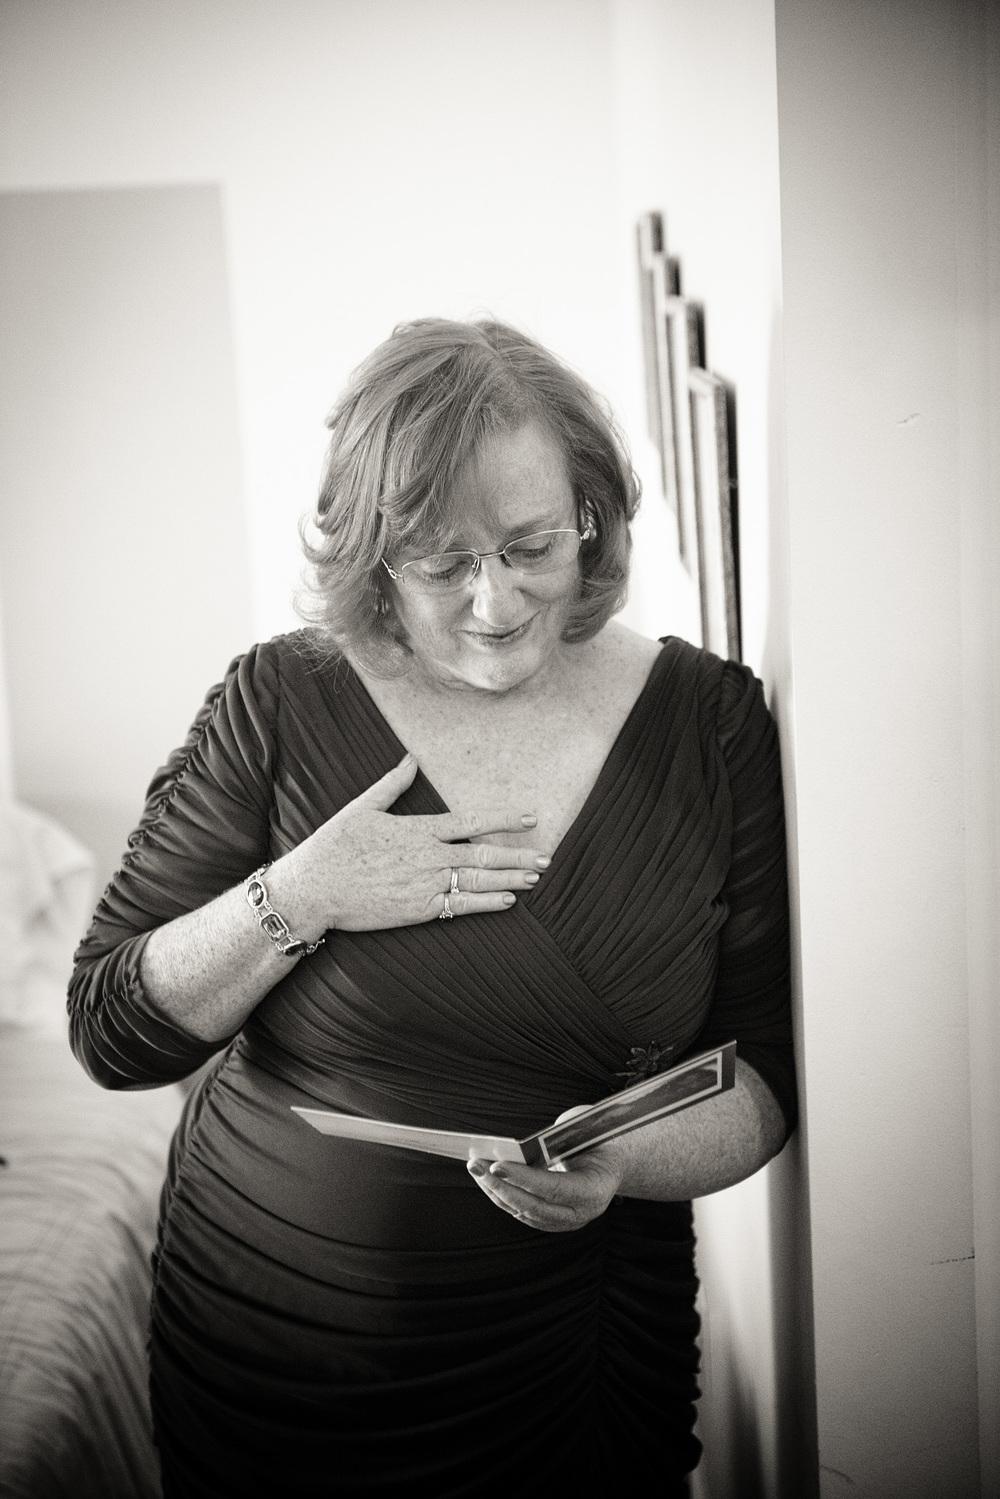 card mother tears joy emotion